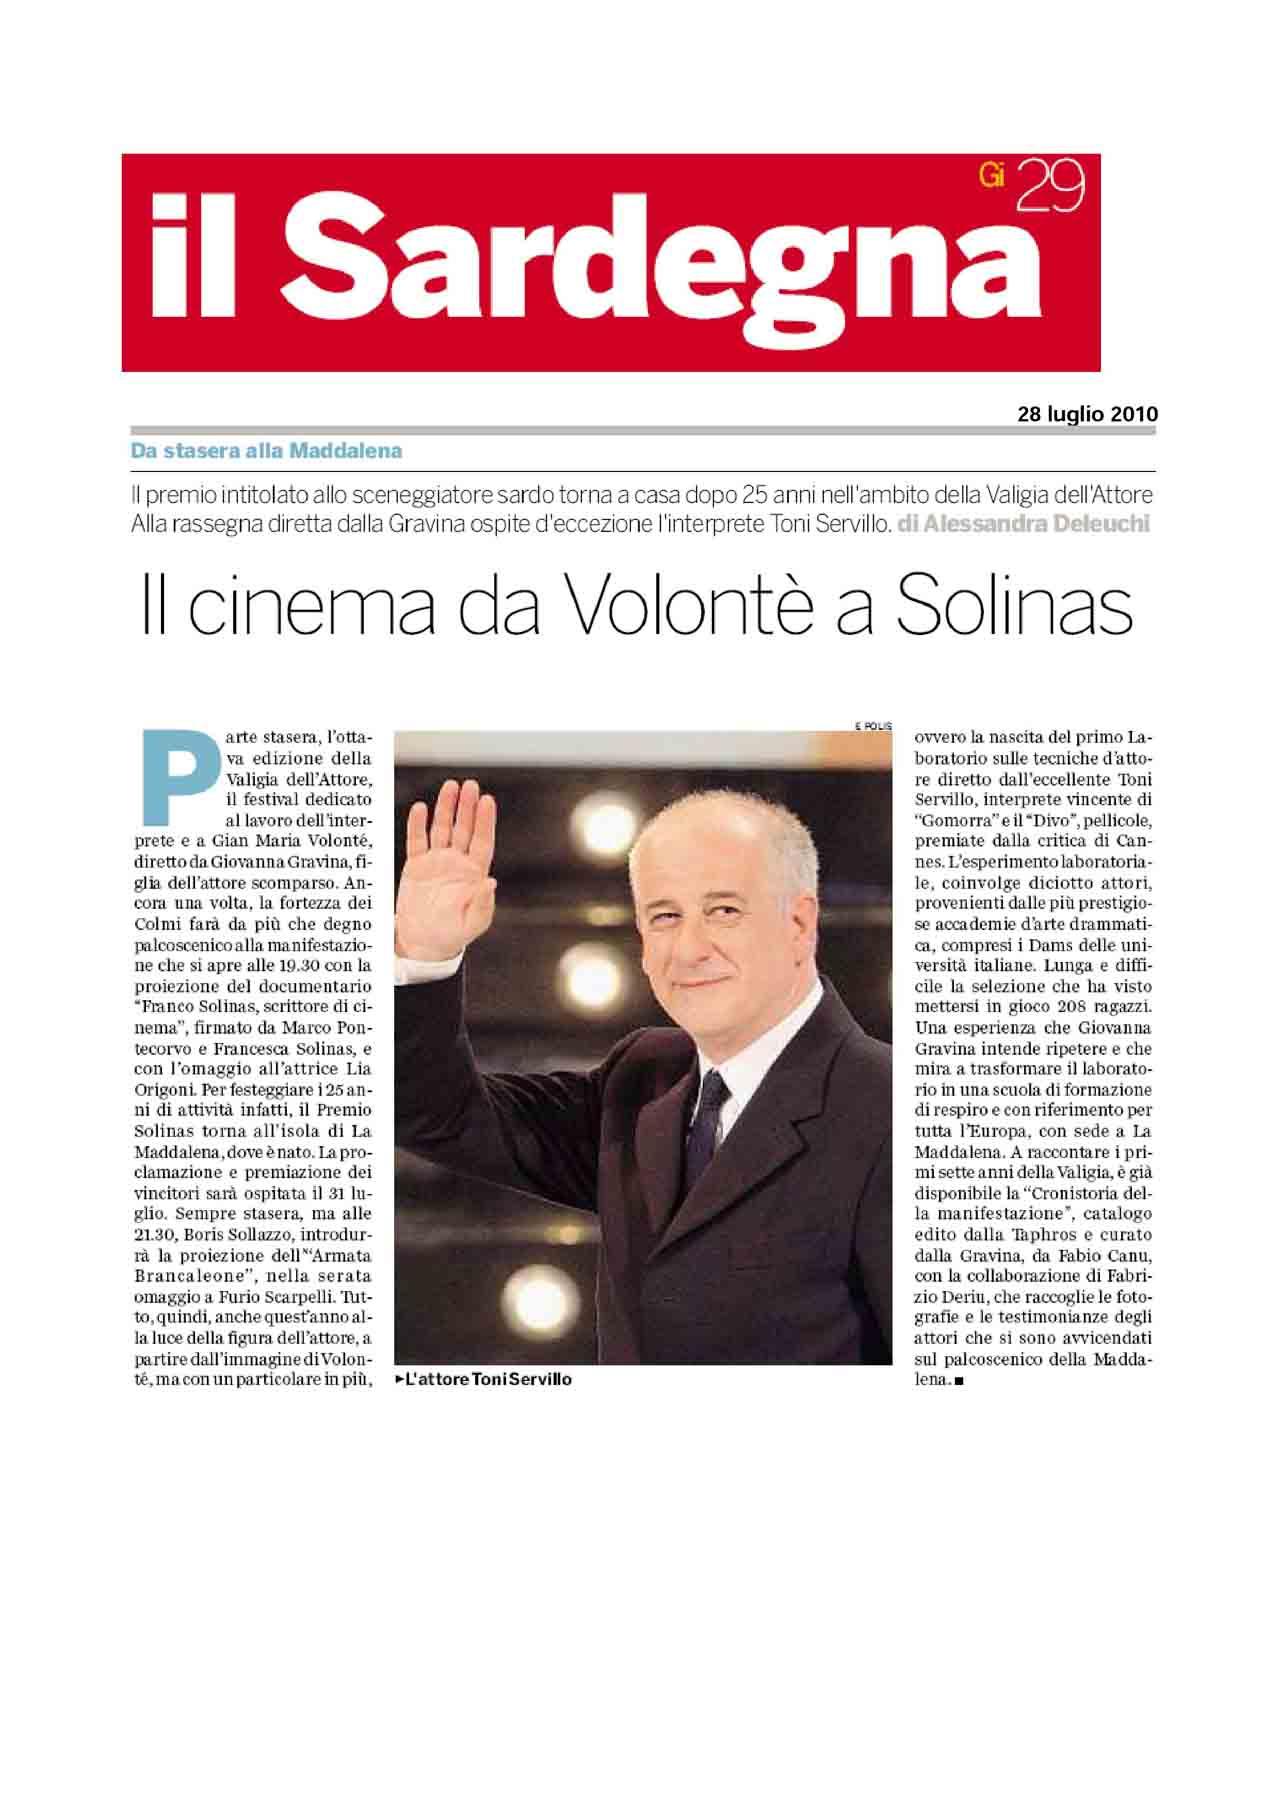 28 07 10 Il Sardegna